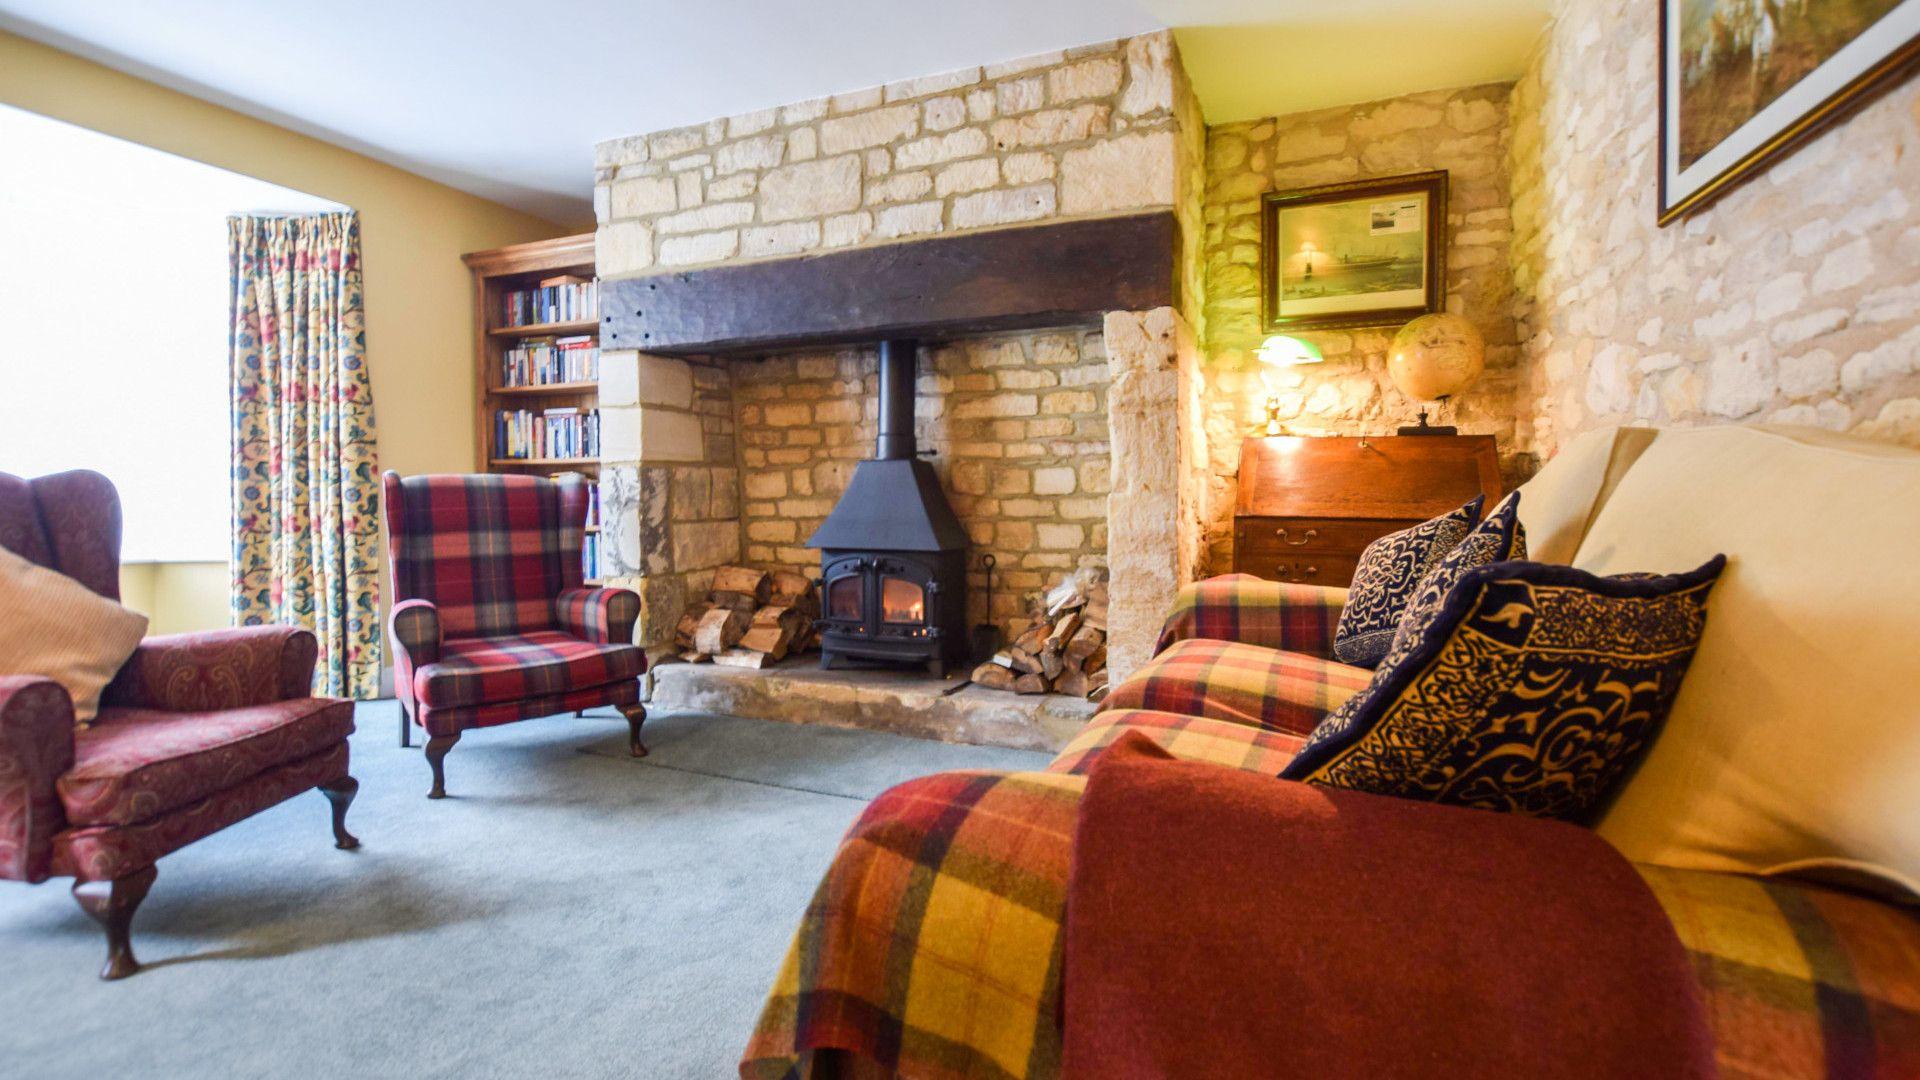 Snug room with log burner, Barebones Farm, Bolthole Retreats